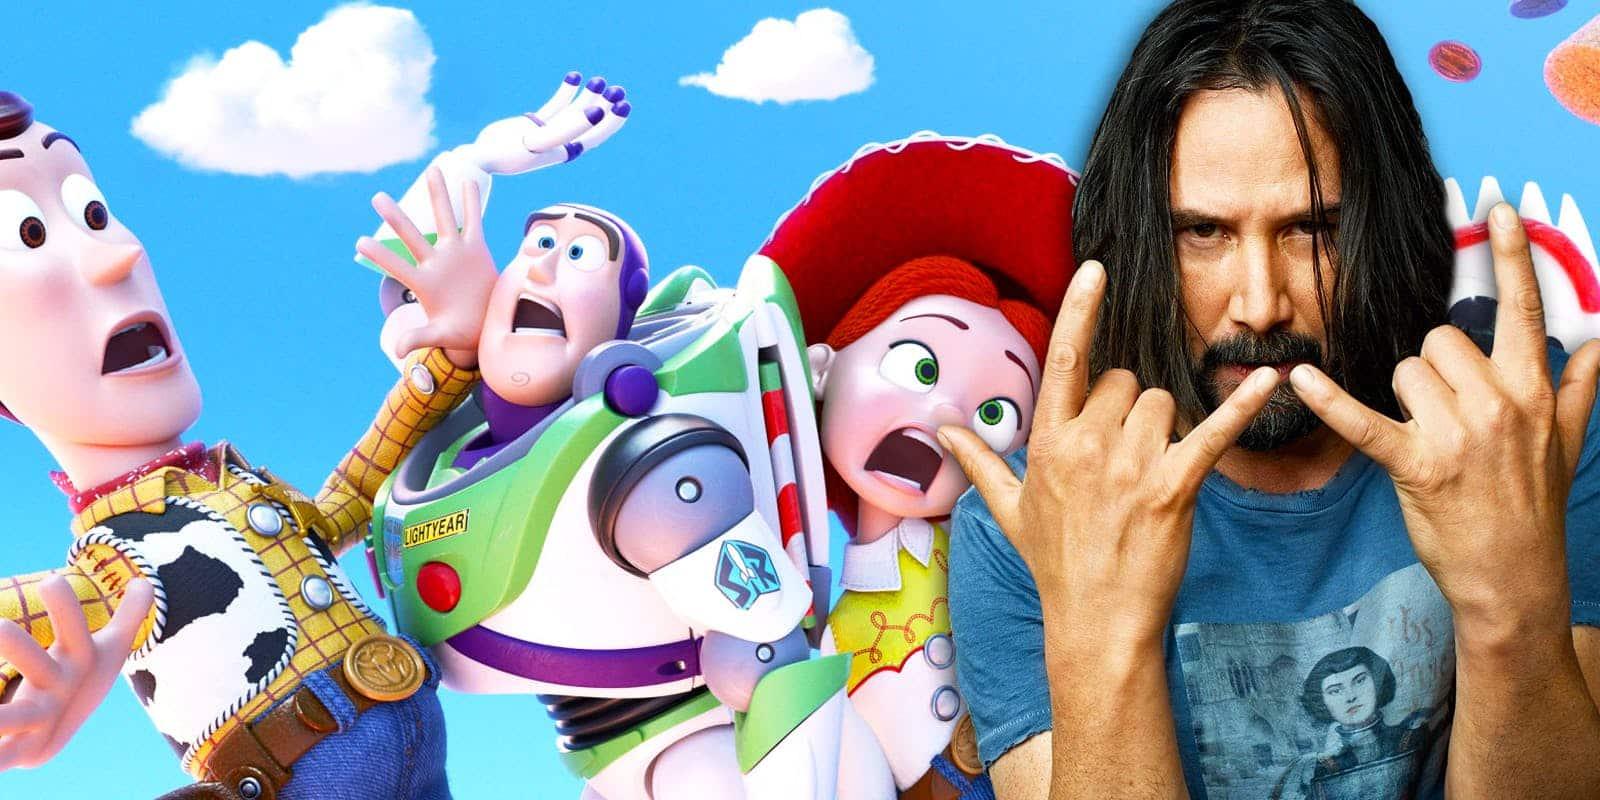 Keanu Reeves interpreta rol misterioso en Toy Story 4 de Disney Pixar